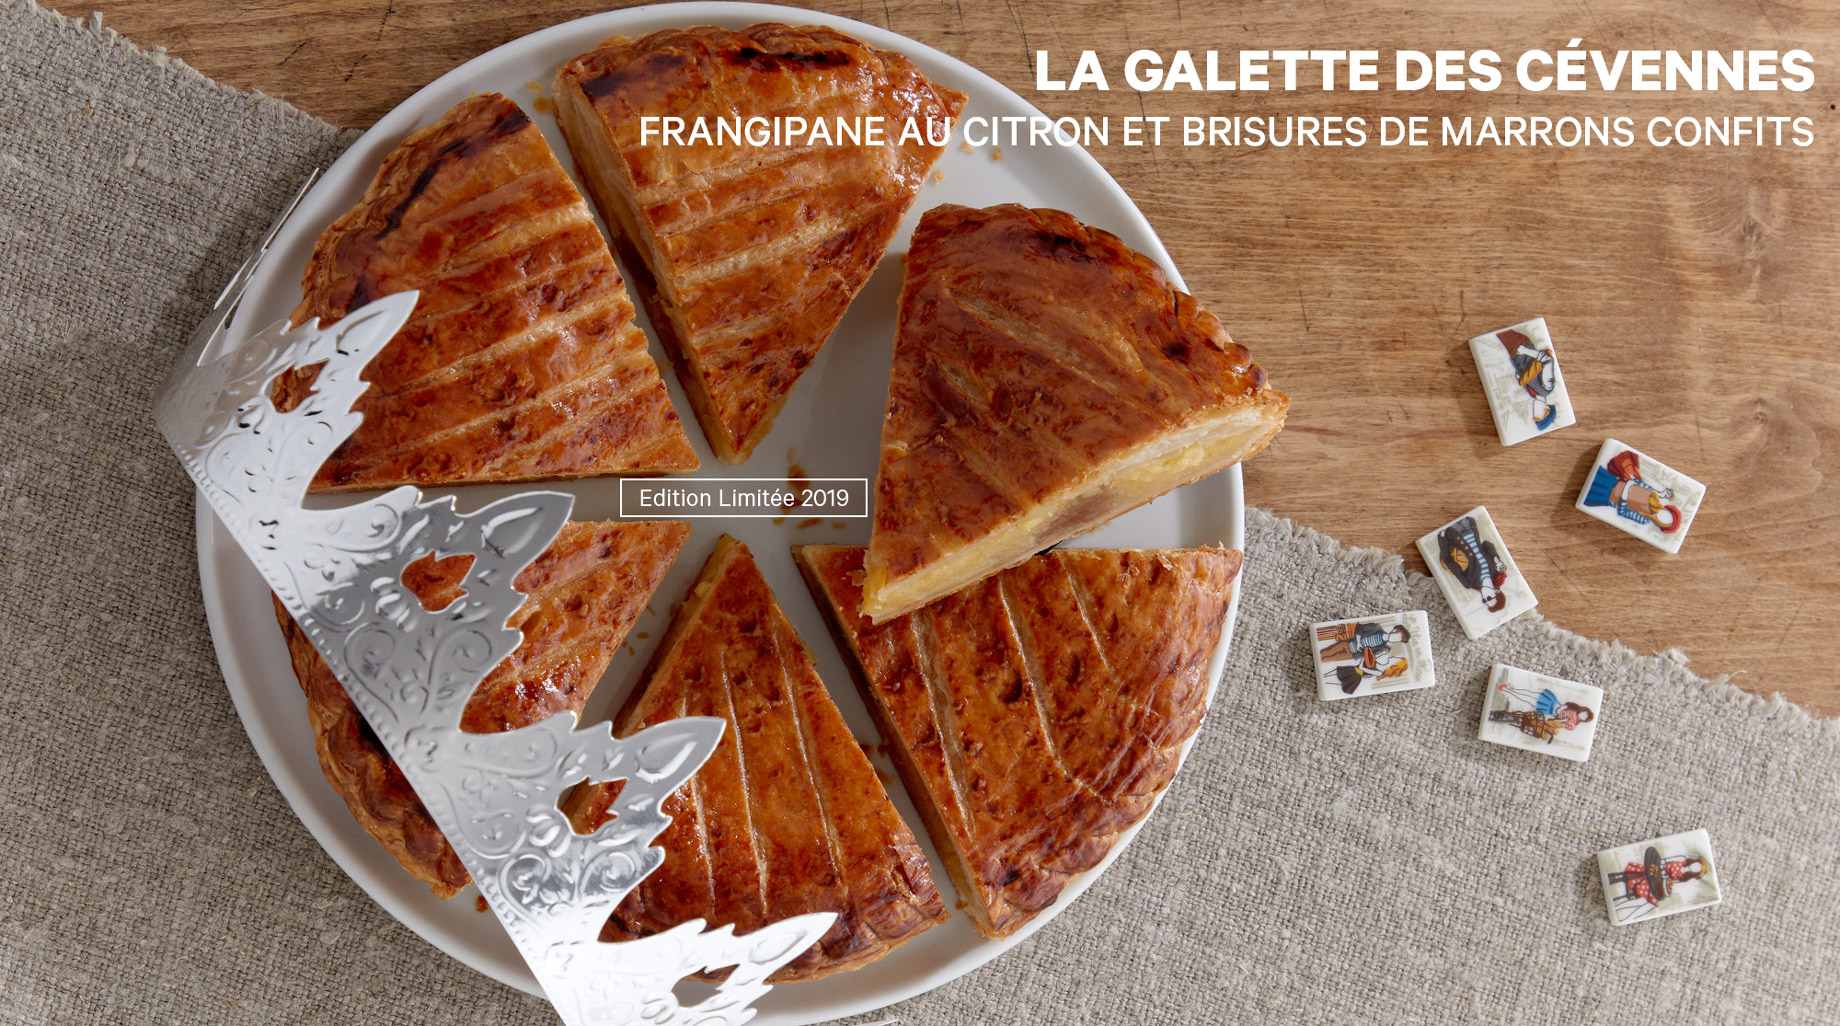 Maison kayser : les boulangeries eric kayser